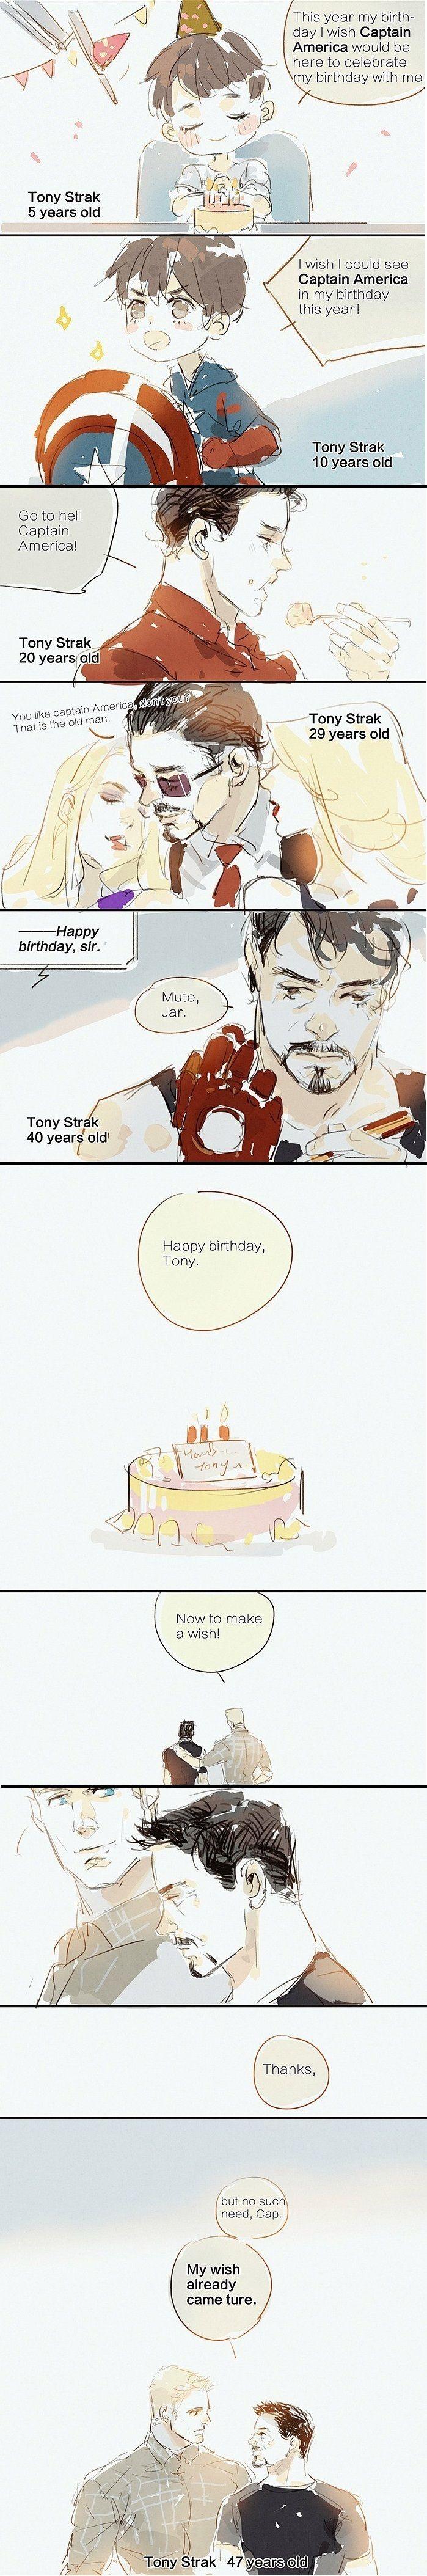 #Stony #SteveRogers #CaptainAmerica #TonyStark #IronMan I see that author made a mistake in the Tony's surname